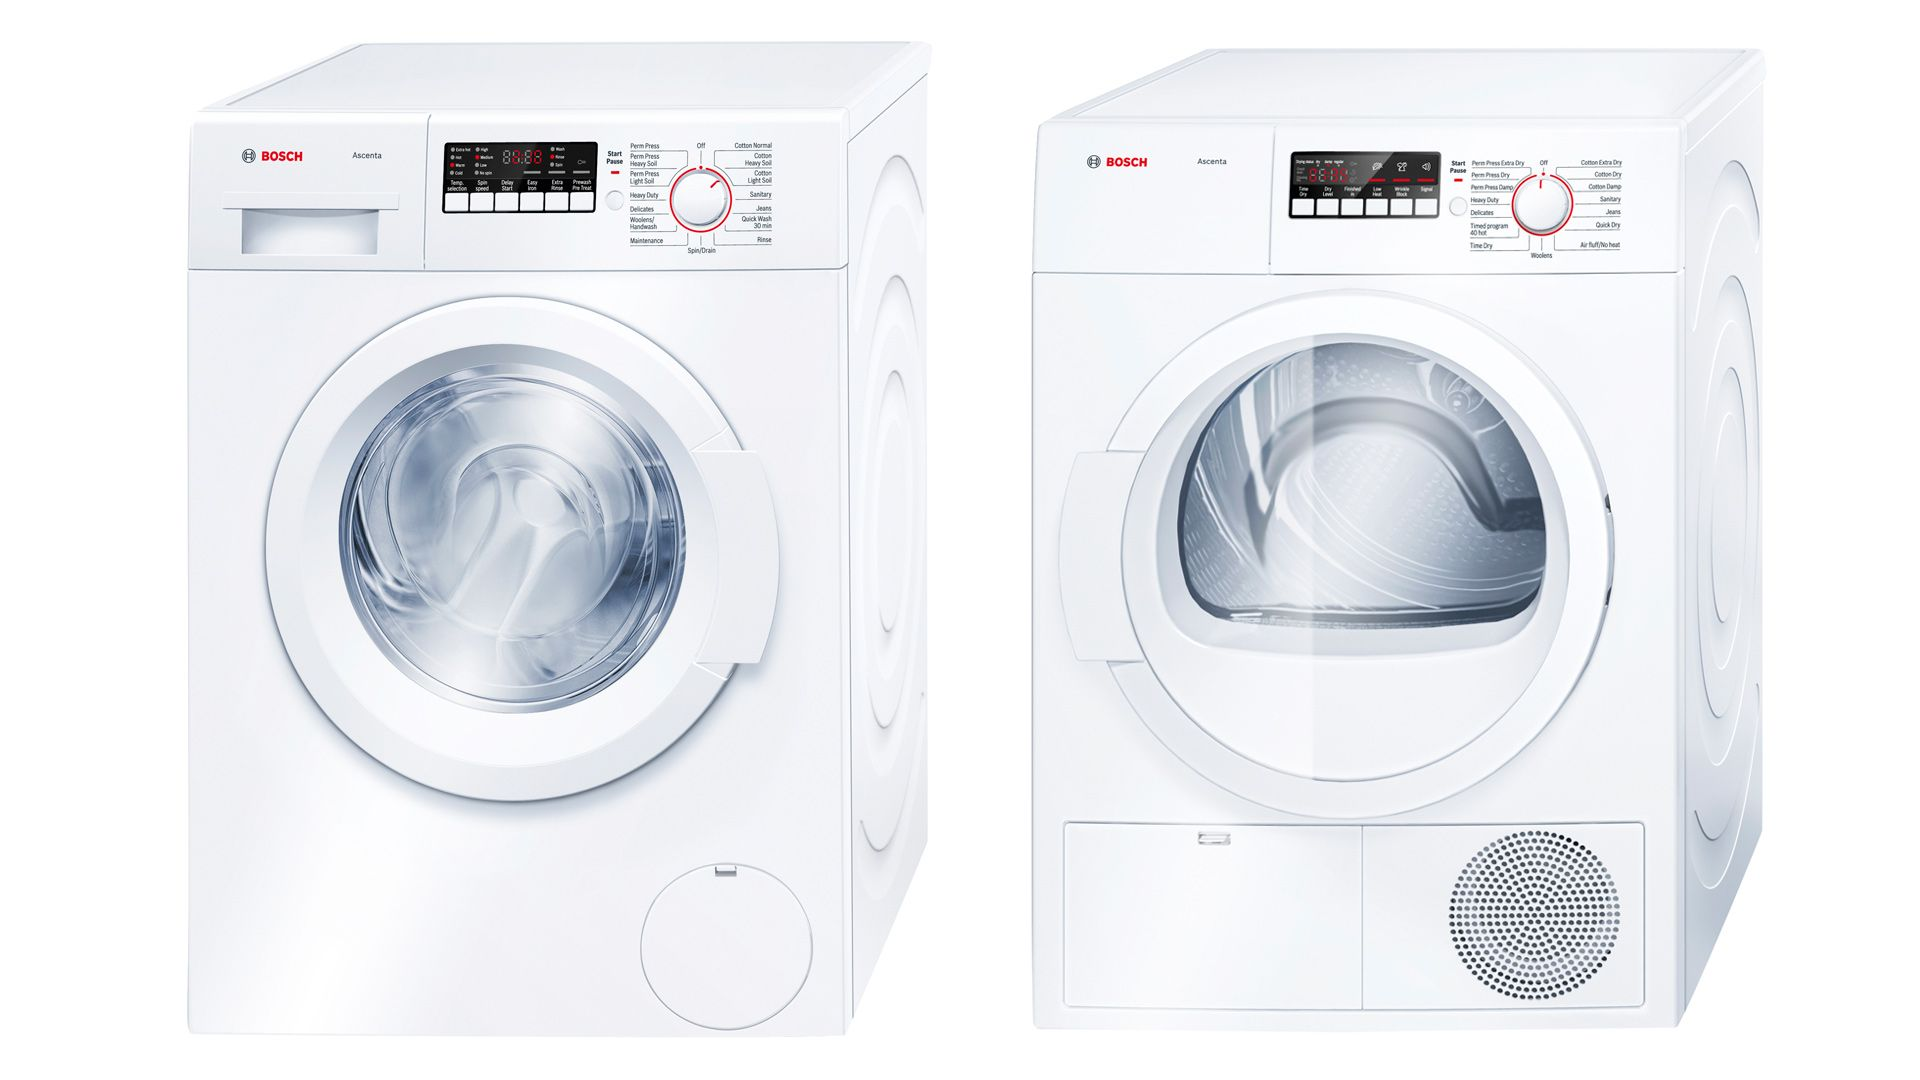 bosch ascenta washer and dryer